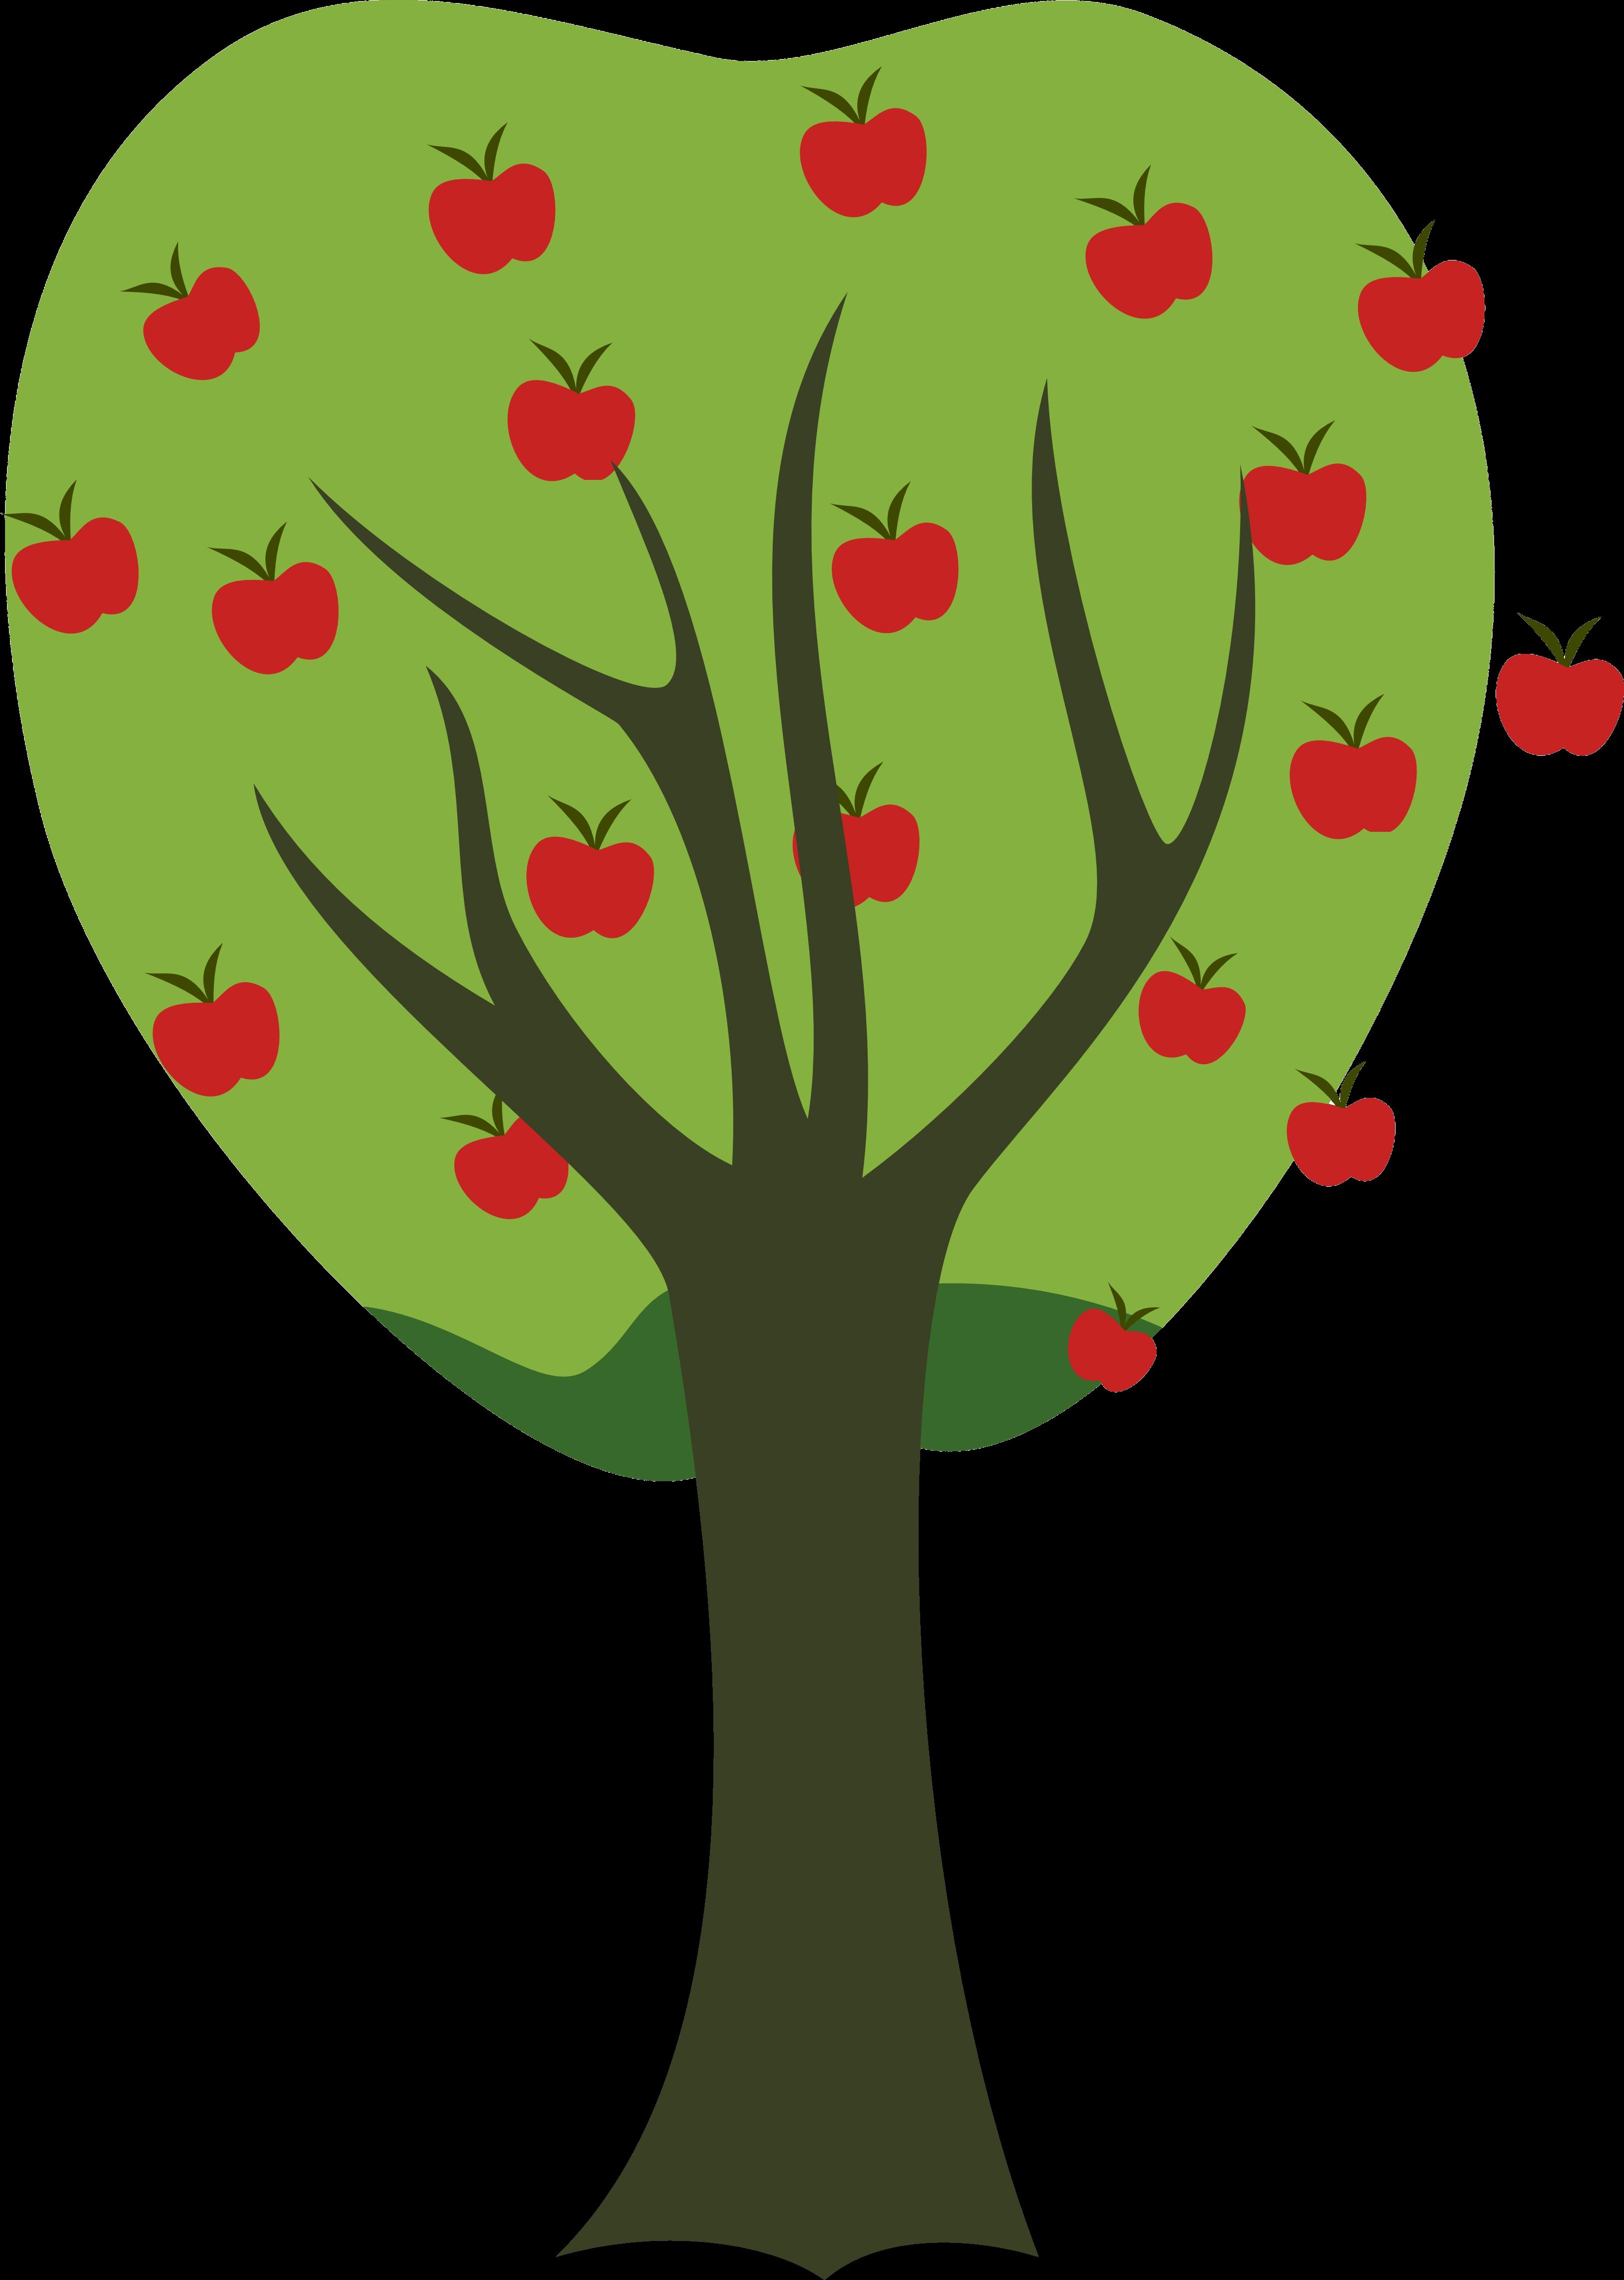 Apple Tree X Stem Clip Art Inspirational Fruit Clipart Png.